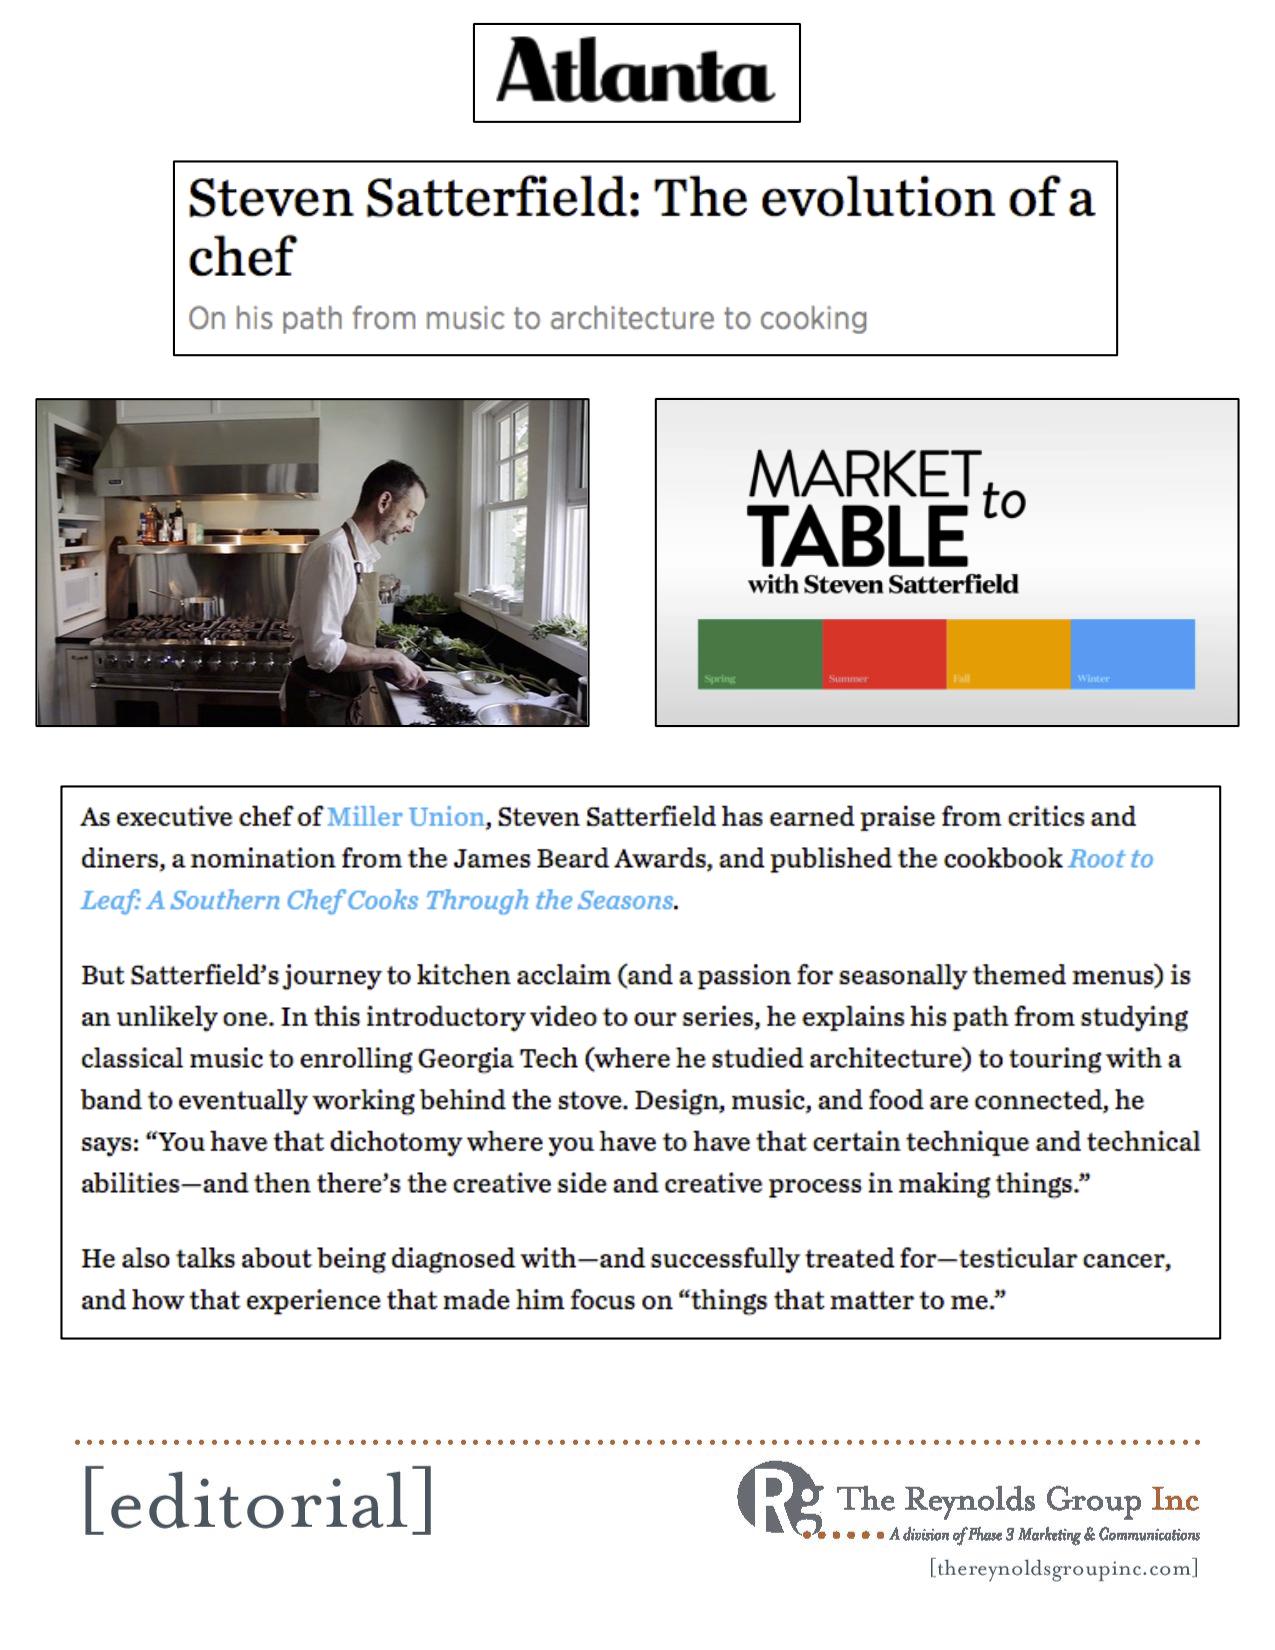 6.25.15.MillerUnion.AtlantaMagazineonline.jpg